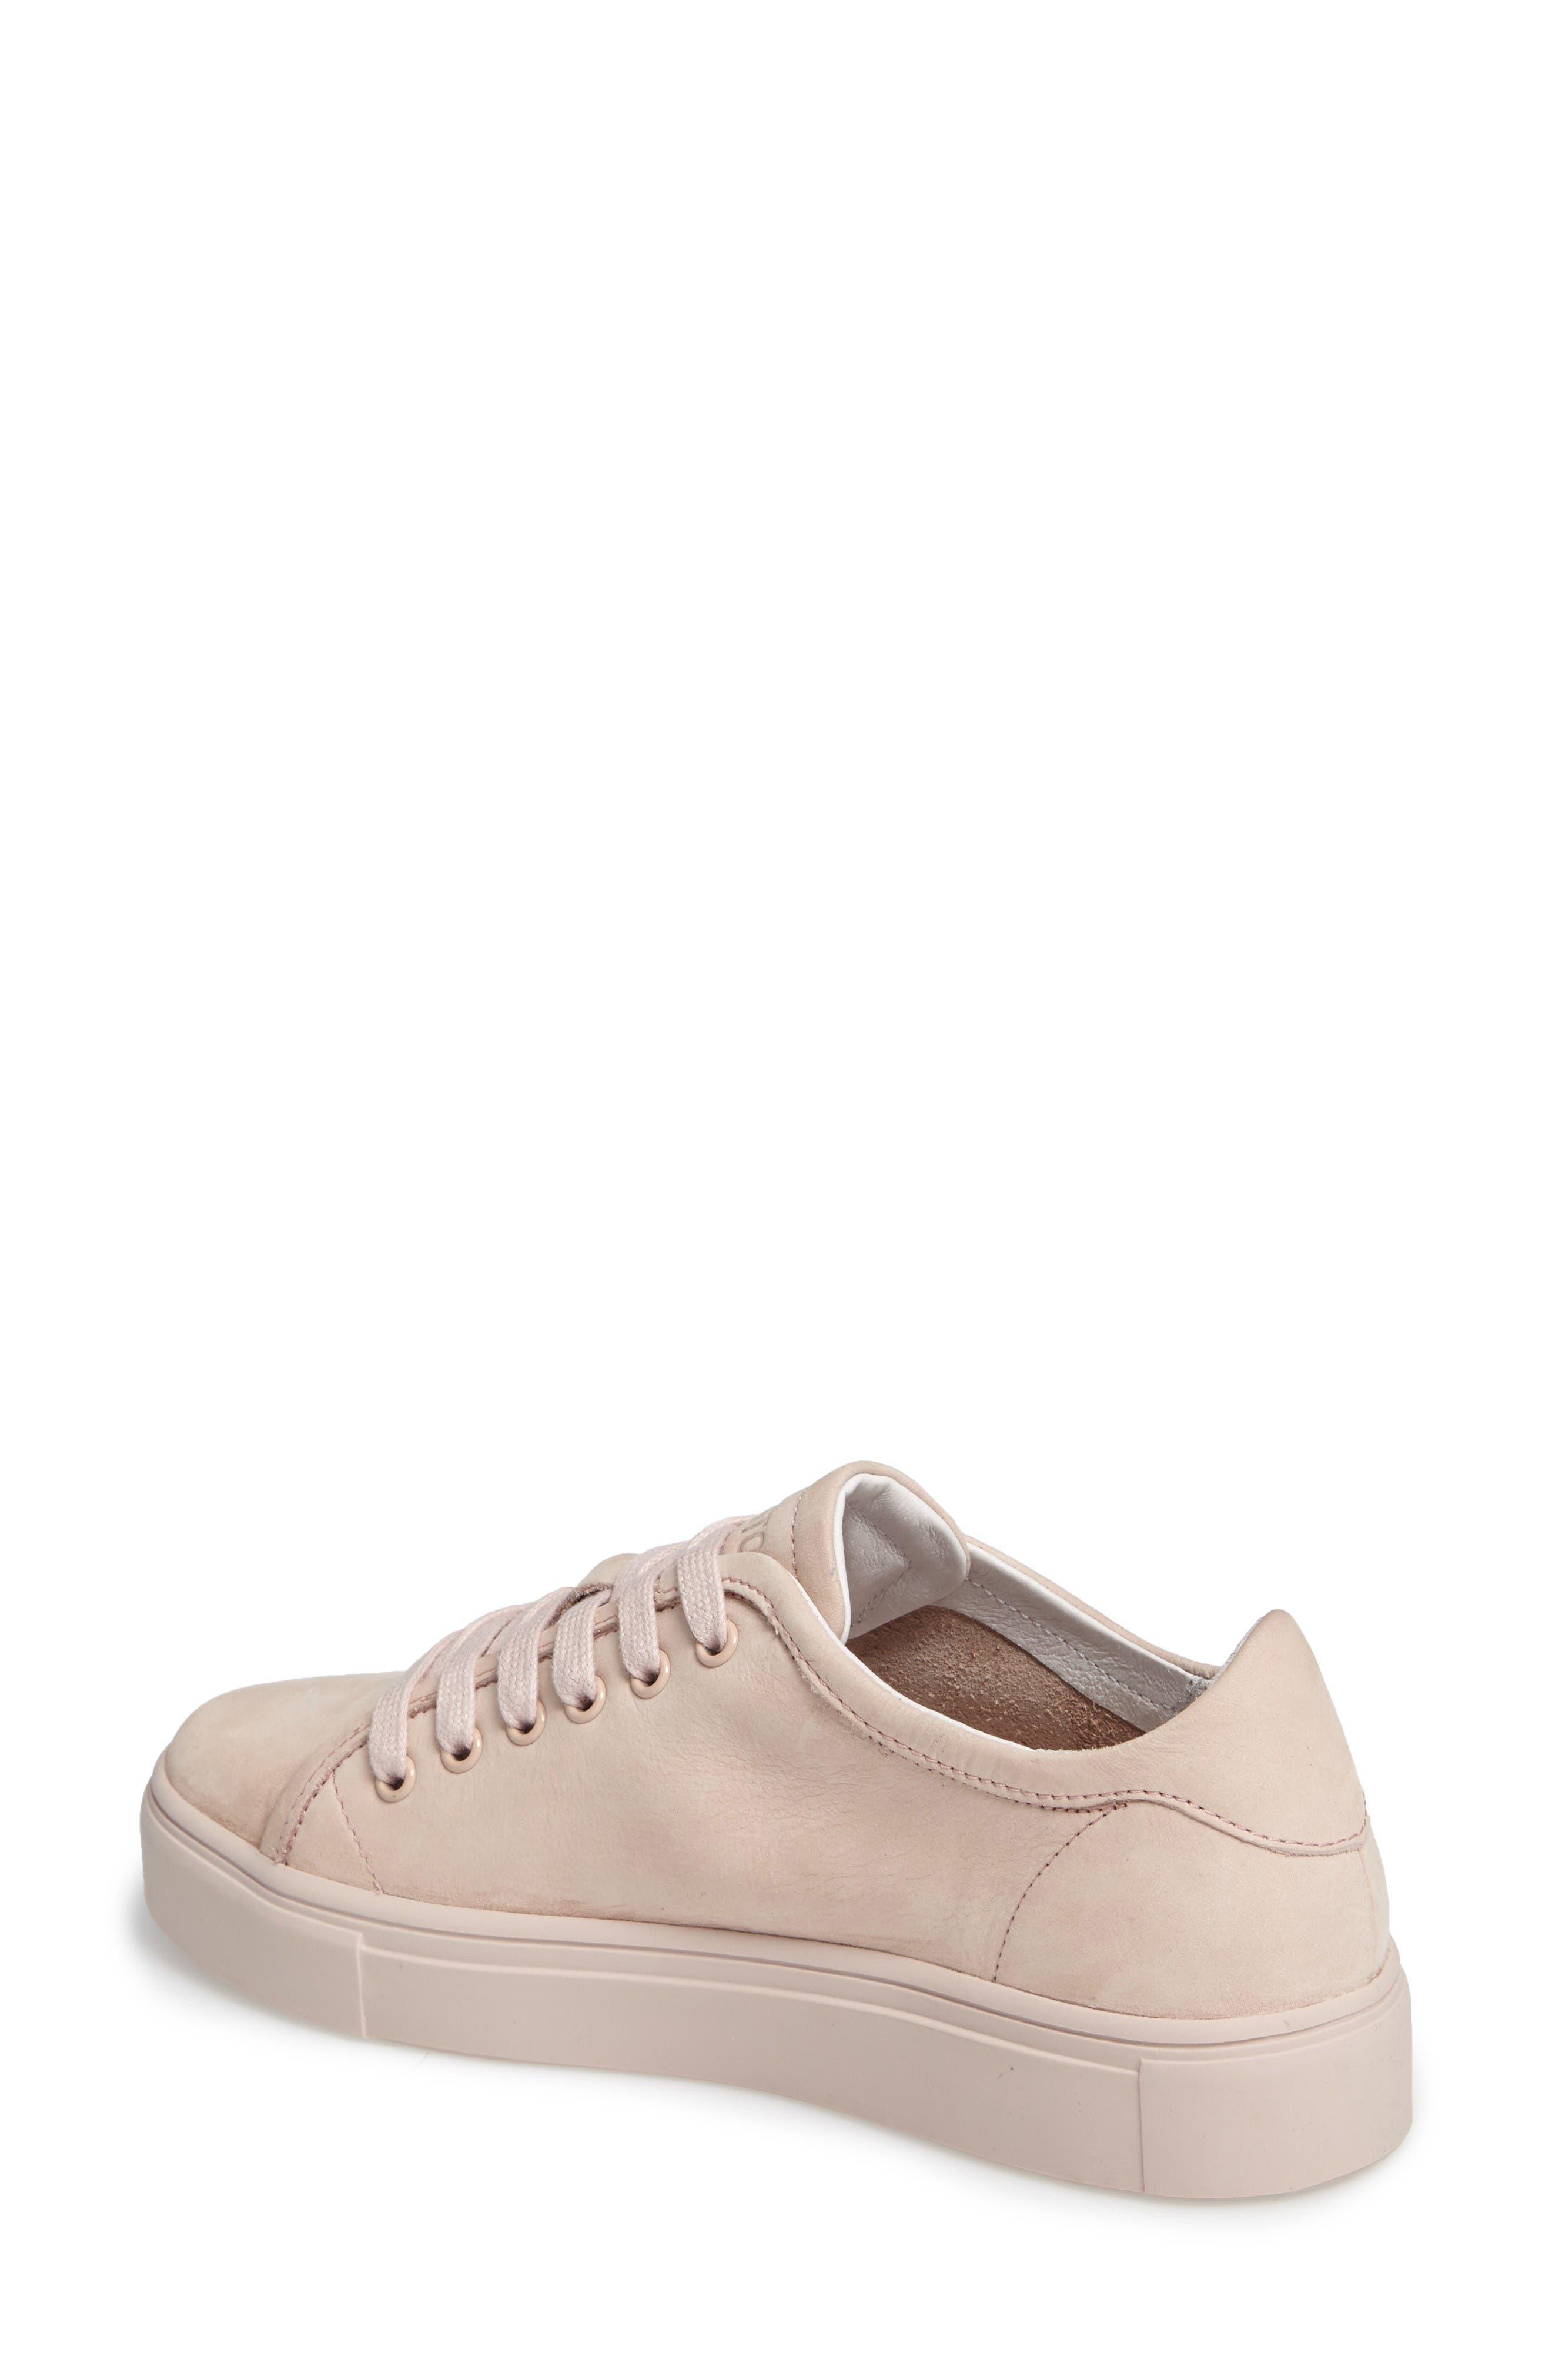 NL33 Sneaker,                             Alternate thumbnail 2, color,                             Dusty Rose Nubuck